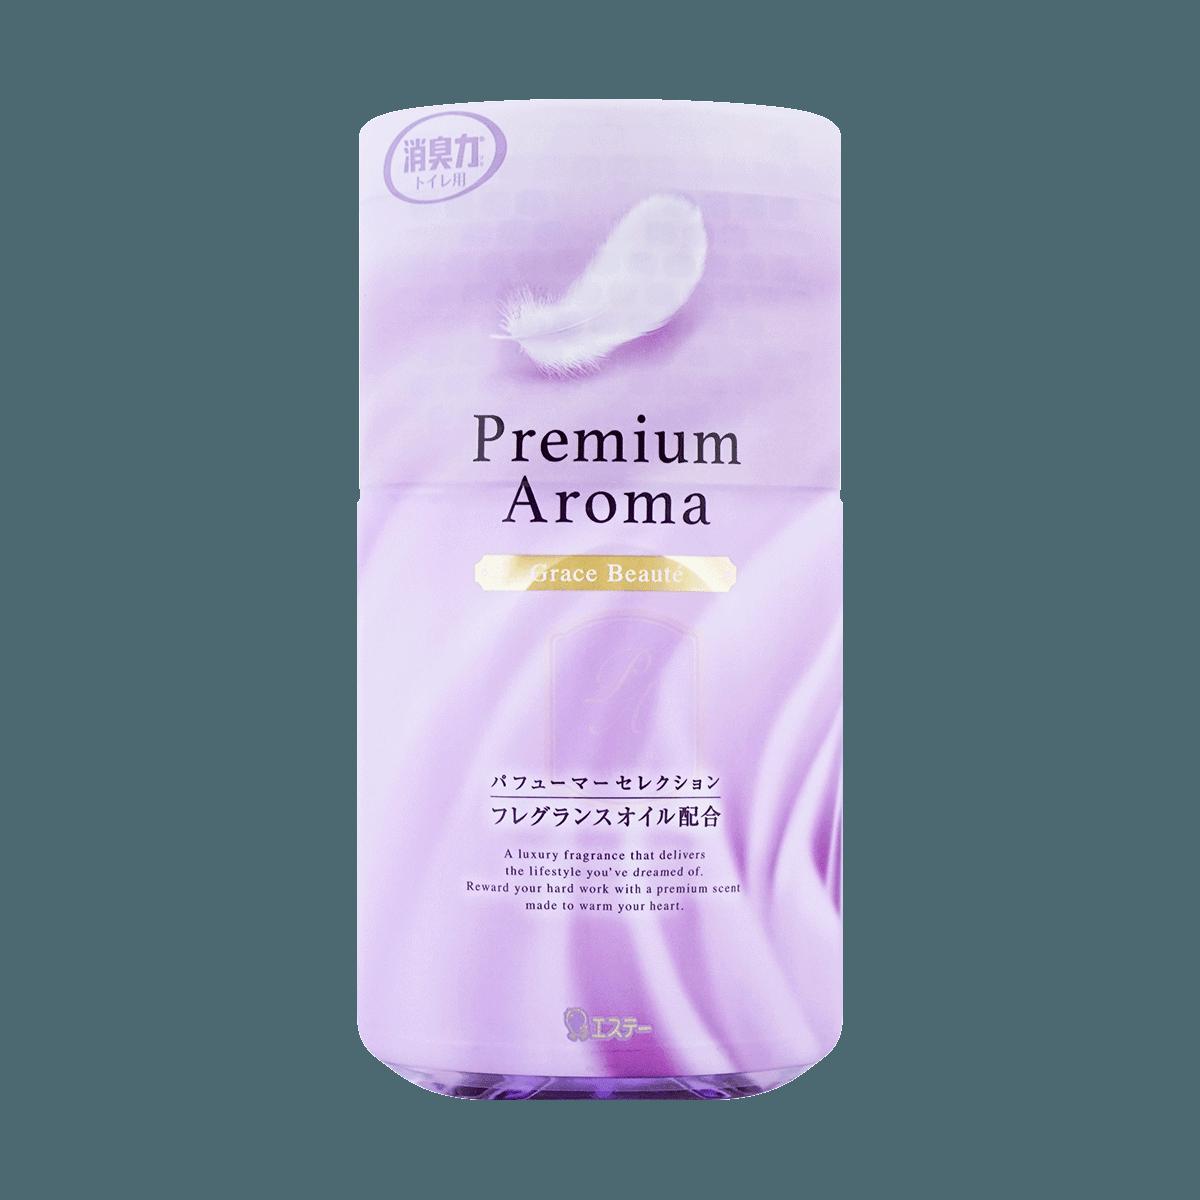 Yamibuy.com:Customer reviews:Japan ST SHOSHU-RIKI Deodorant Fragrance For Bathroom 400ml #Grace Beaute